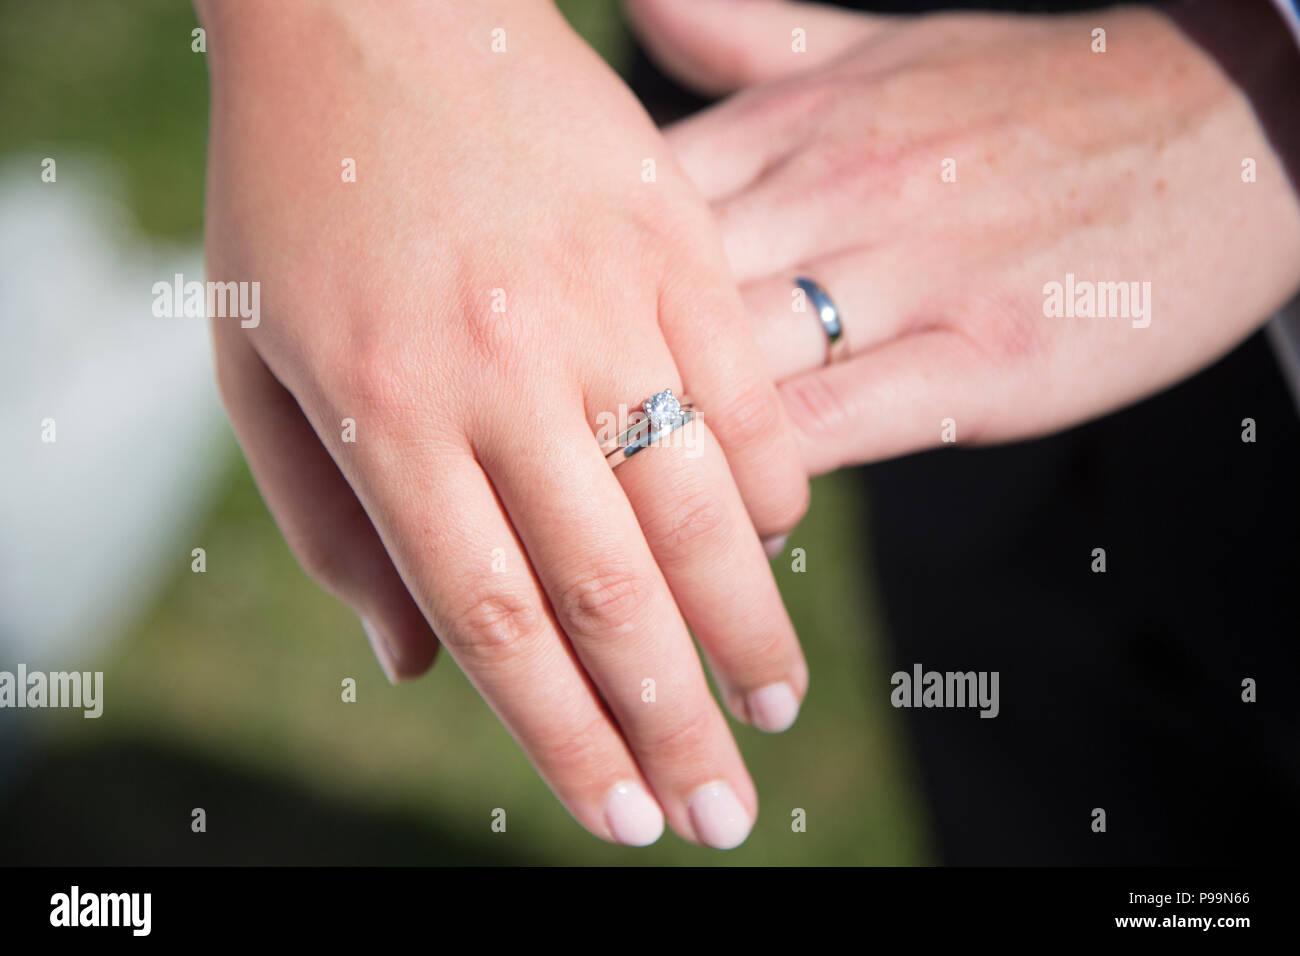 Jewellery Rings Fingers Stock Photos & Jewellery Rings Fingers Stock ...